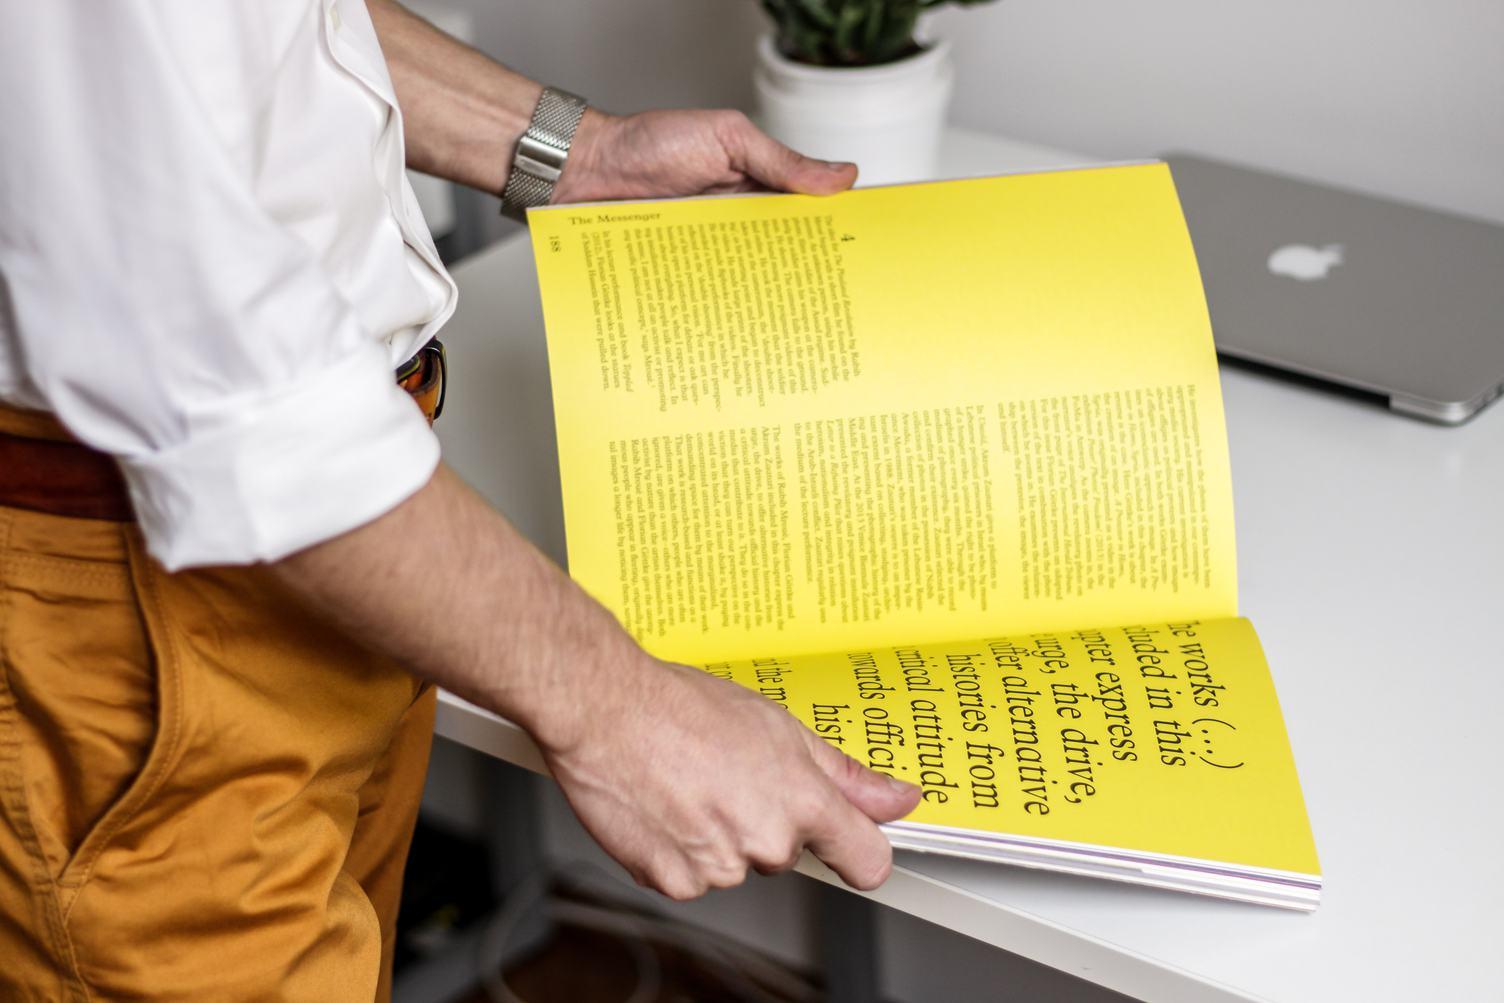 Man Reading a Magazine on a Desk Background